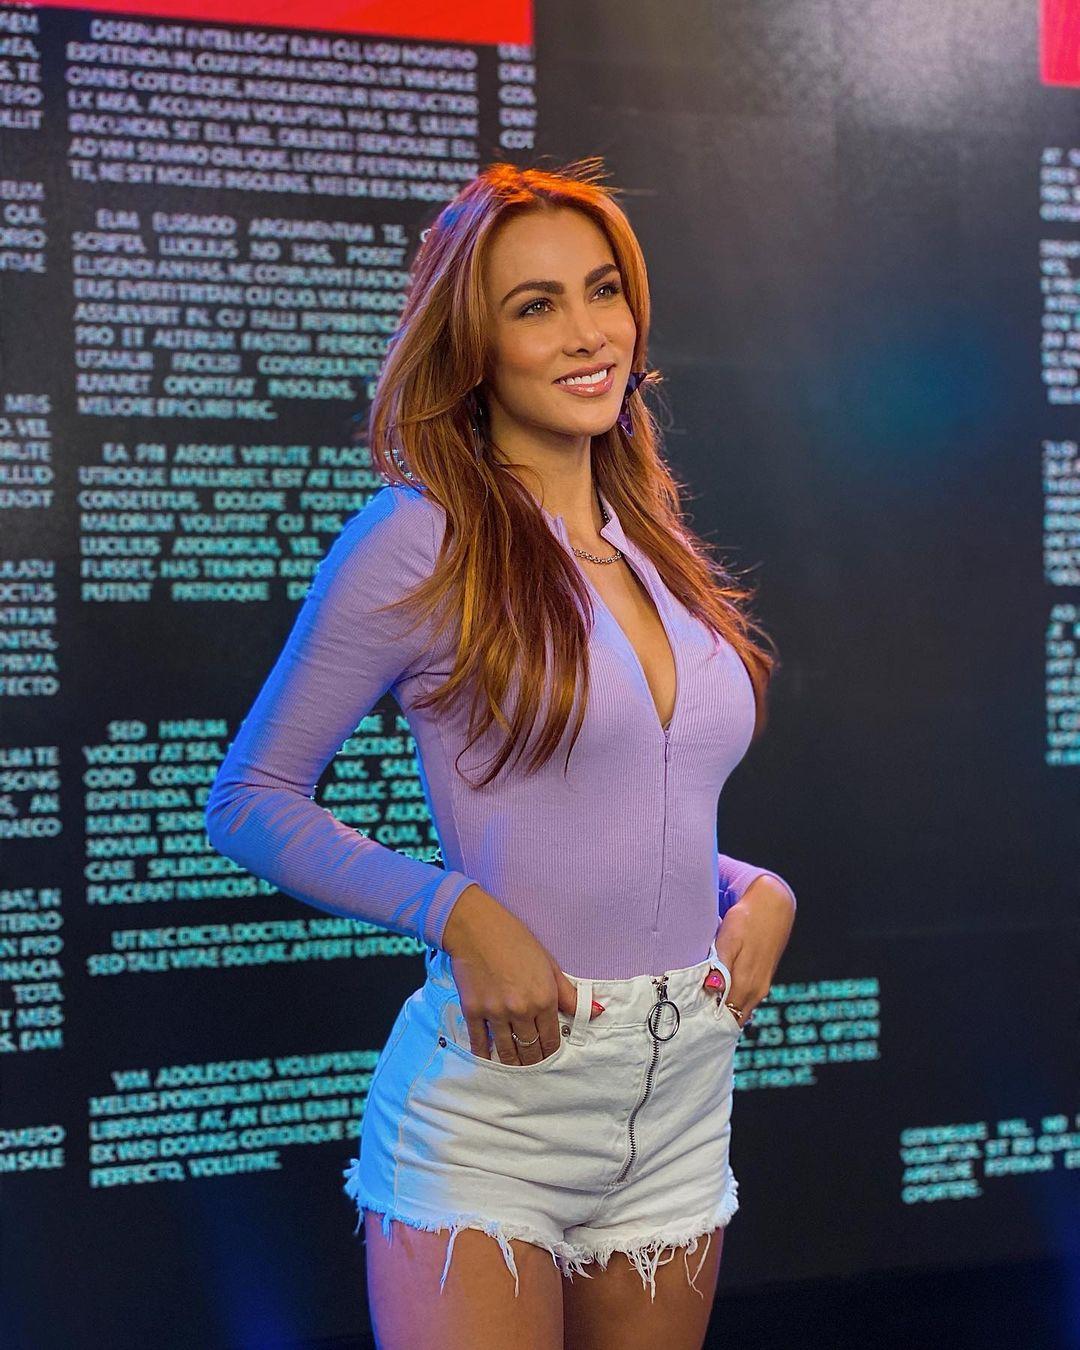 Karina-Ramos-Wallpapers-Insta-Fit-Bio-6